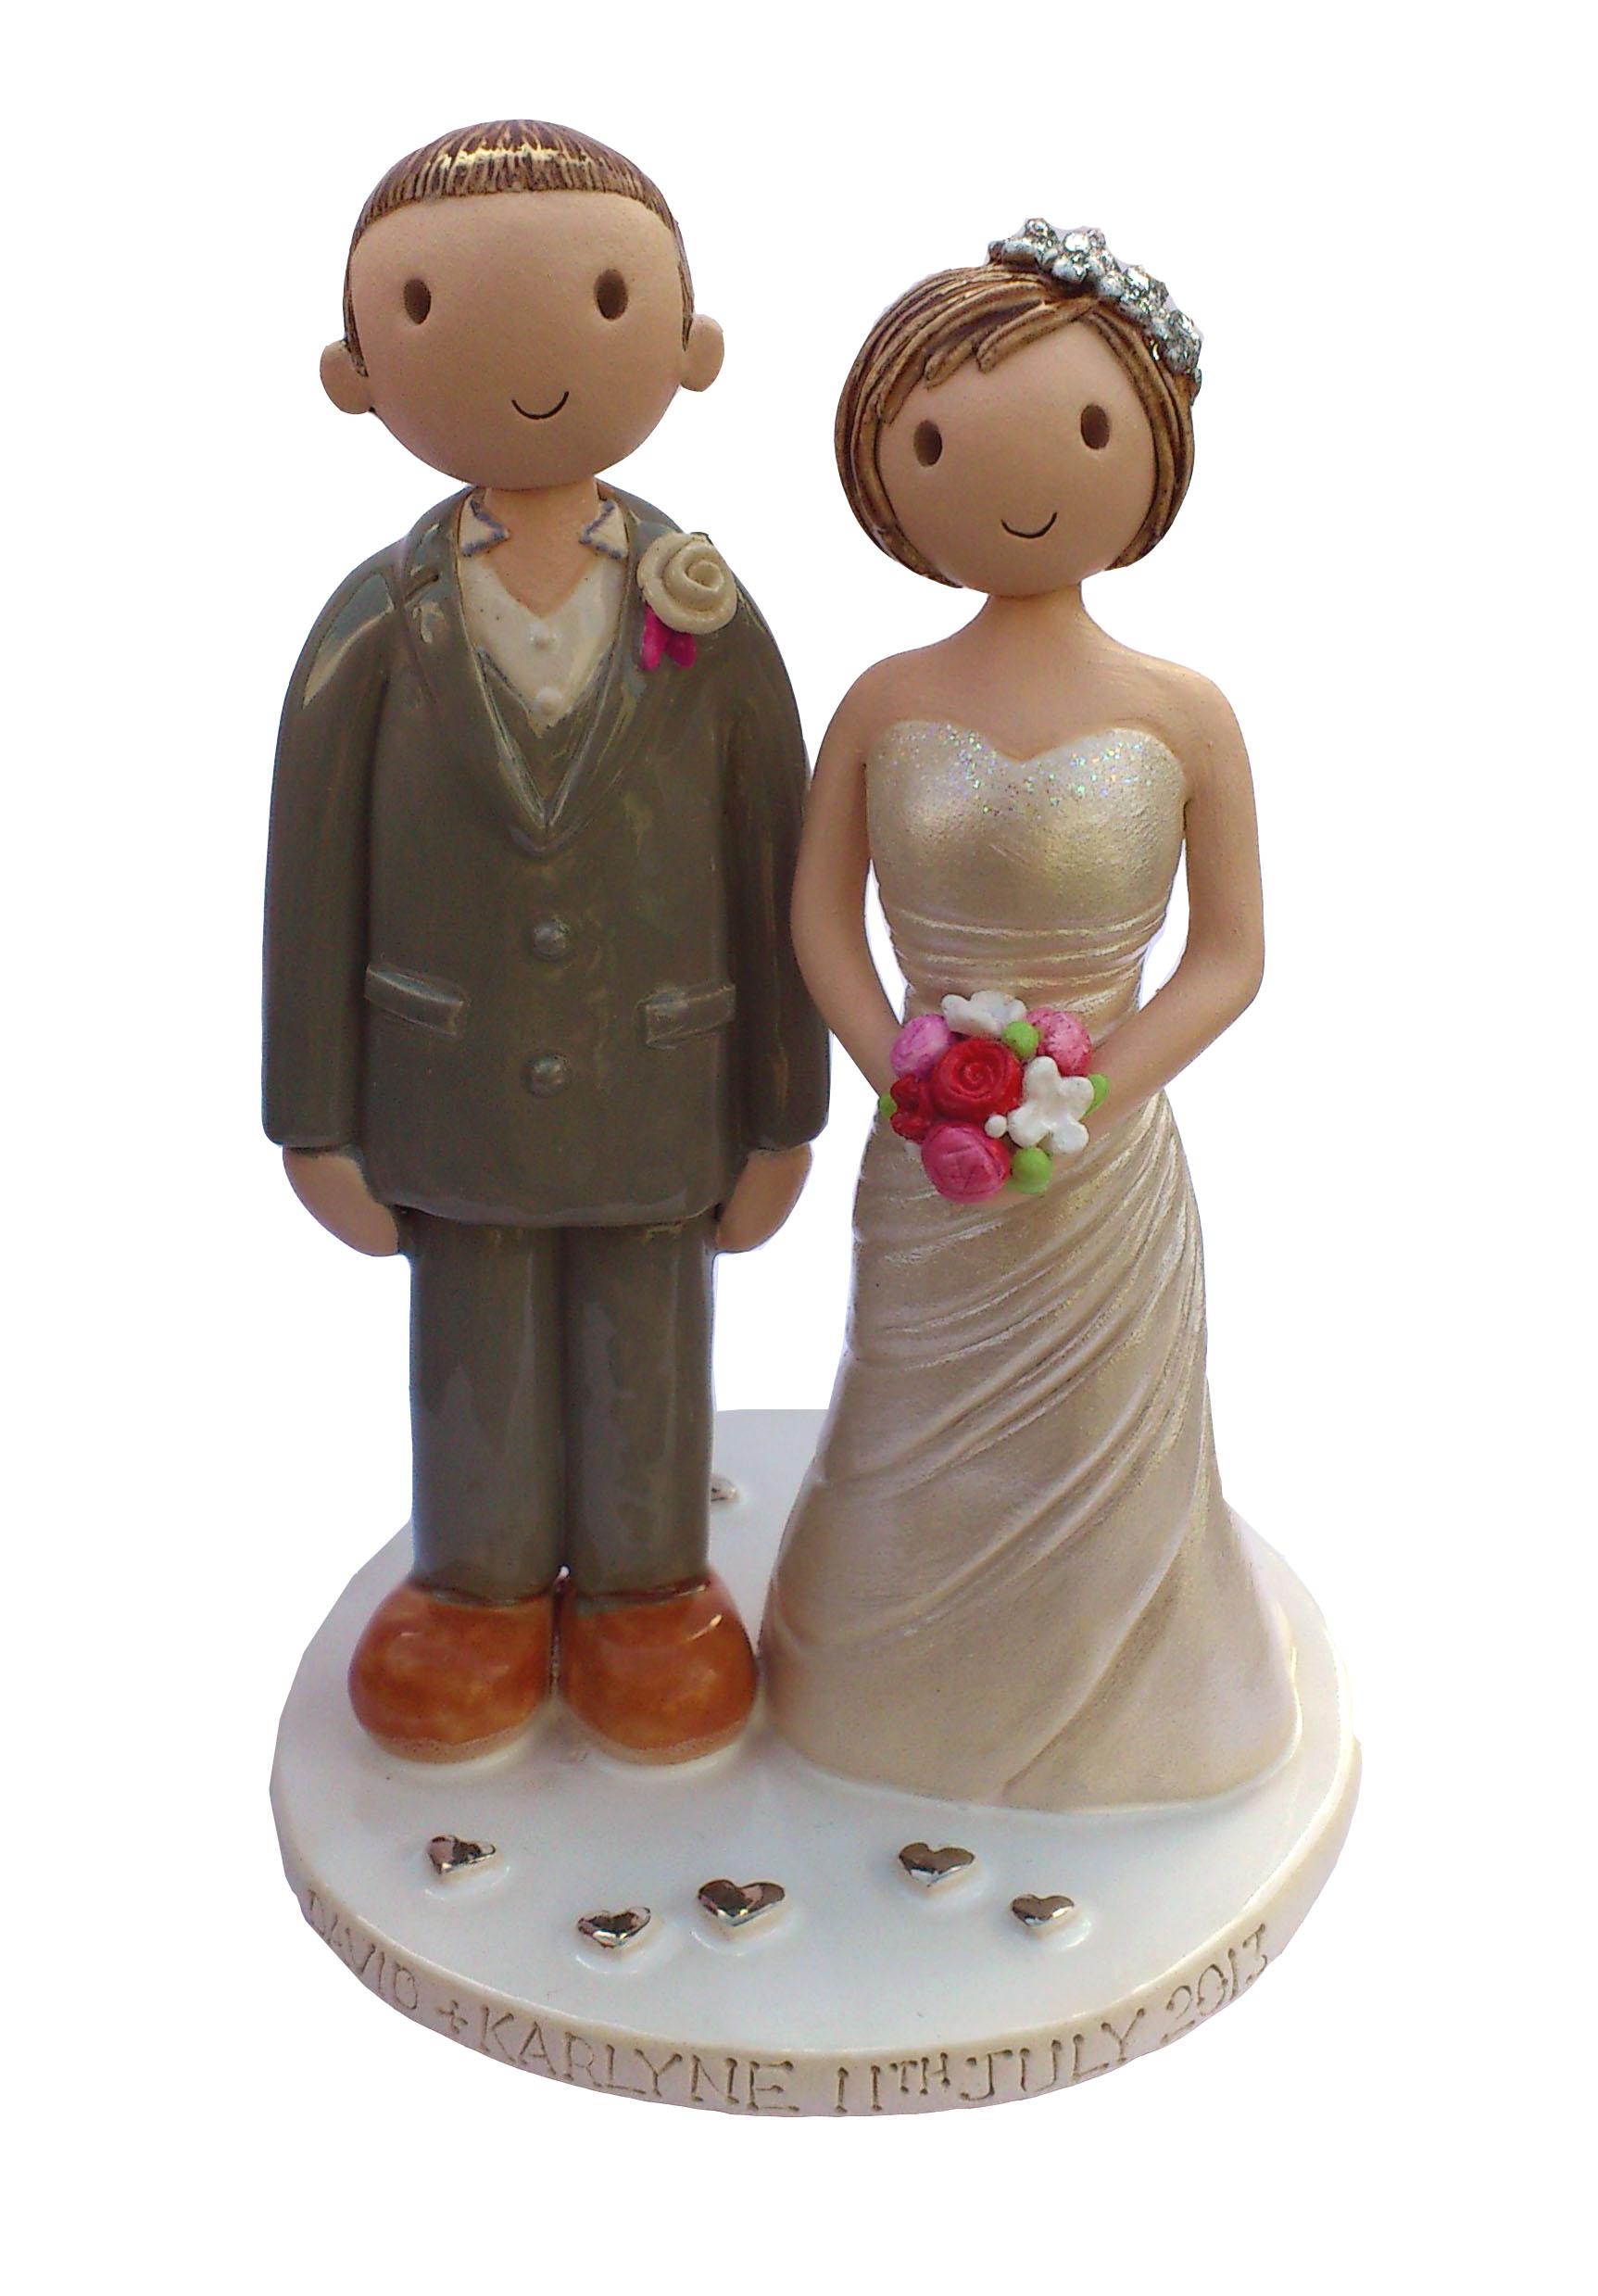 Wedding Cake Toppers Uk Personalised : Wedding Cake Toppers Gallery. Personalised Cake Topper ...